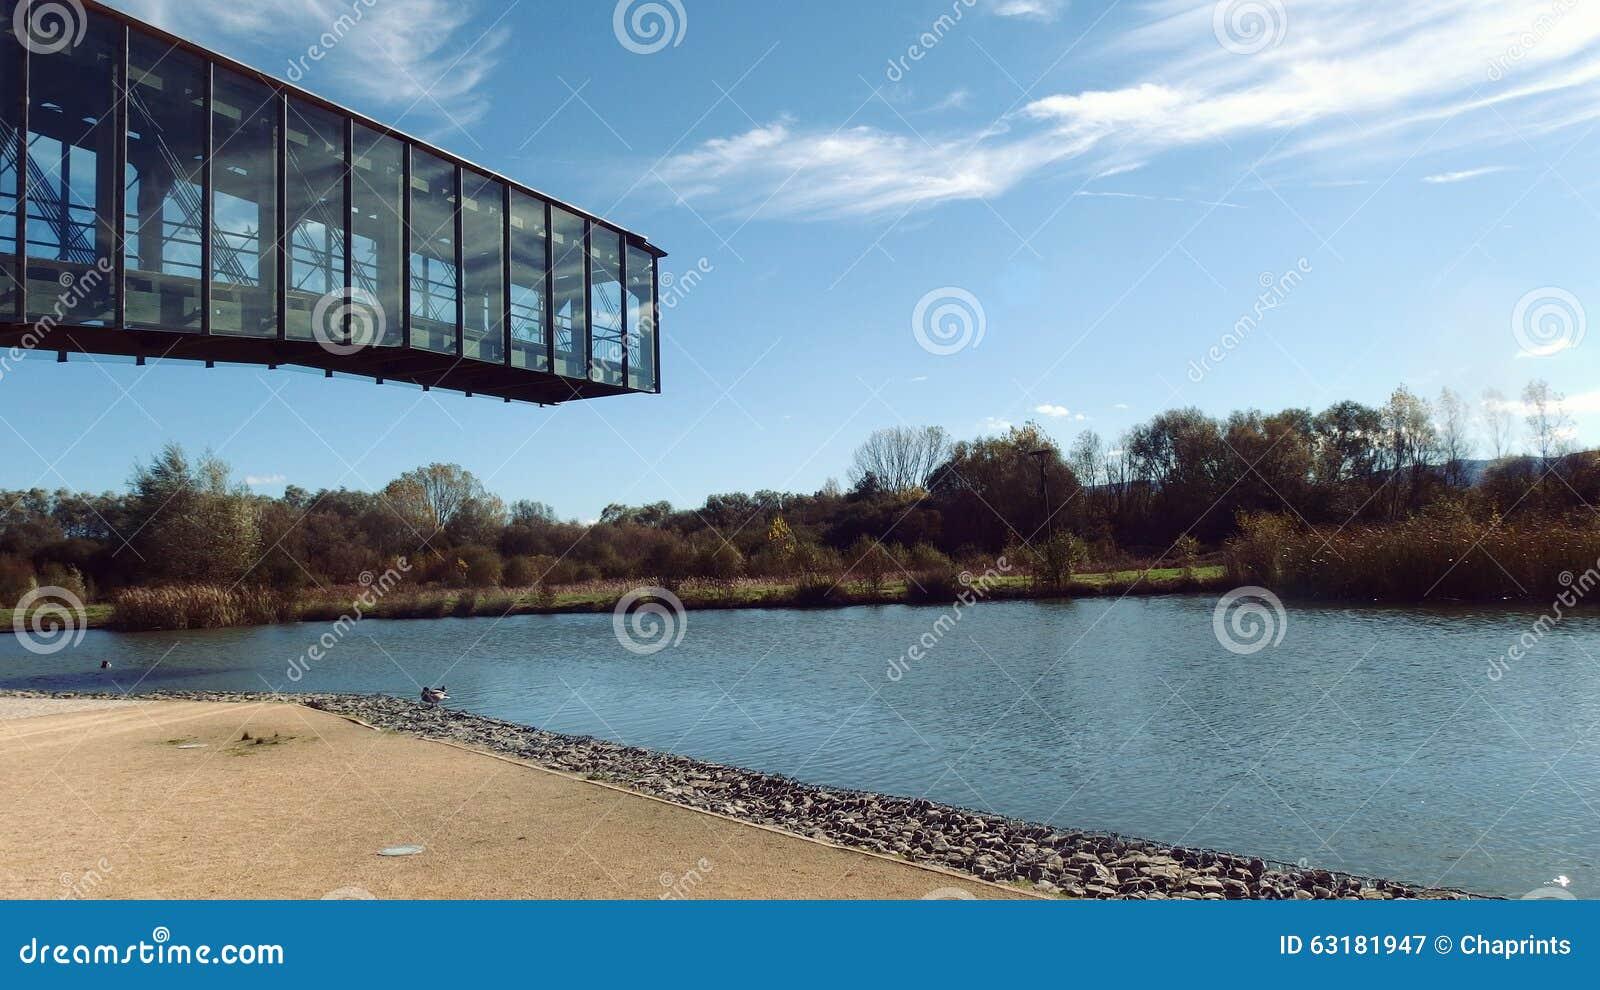 Birding-Observatorium-Struktur